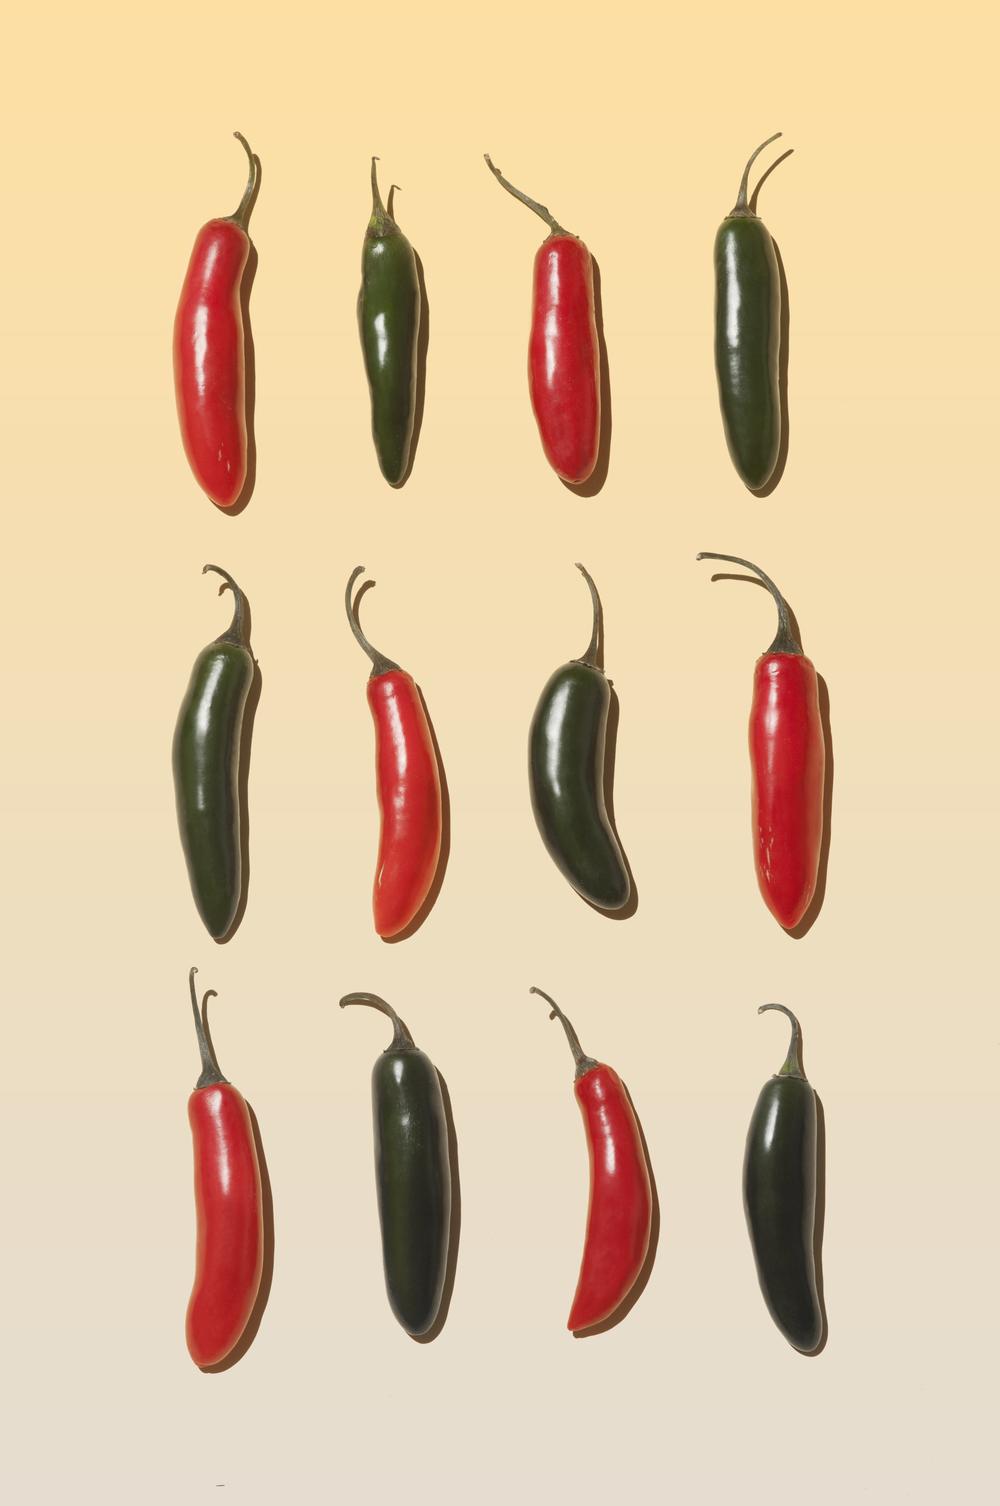 Serrano Peppers_0001_20141012-14_comp_FInal_grad.jpg